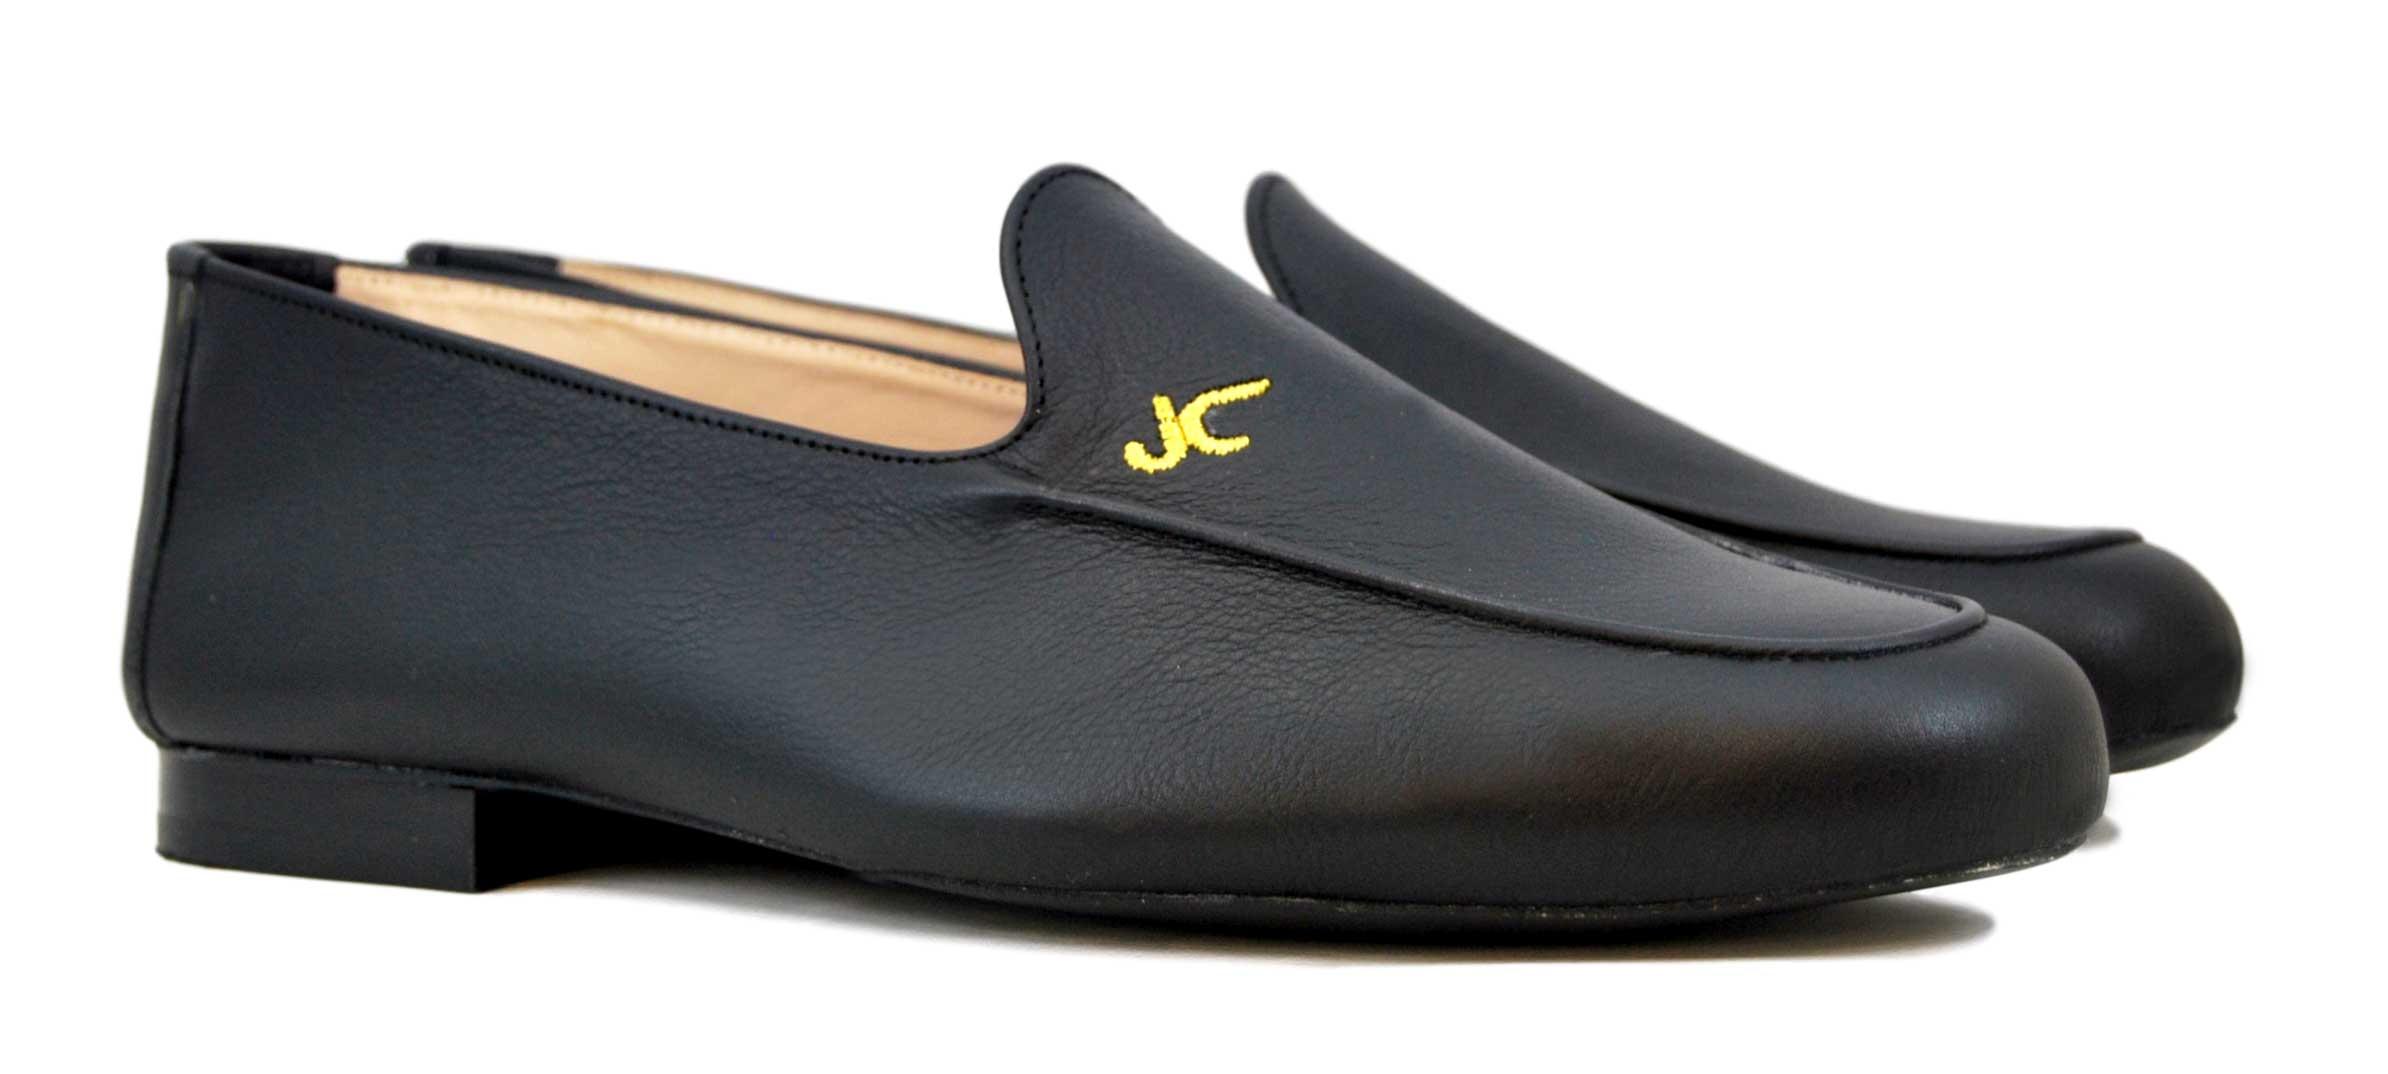 Foto 5 de Zapatos Julio Iglesias Mocasin 528 JC Negro Napa